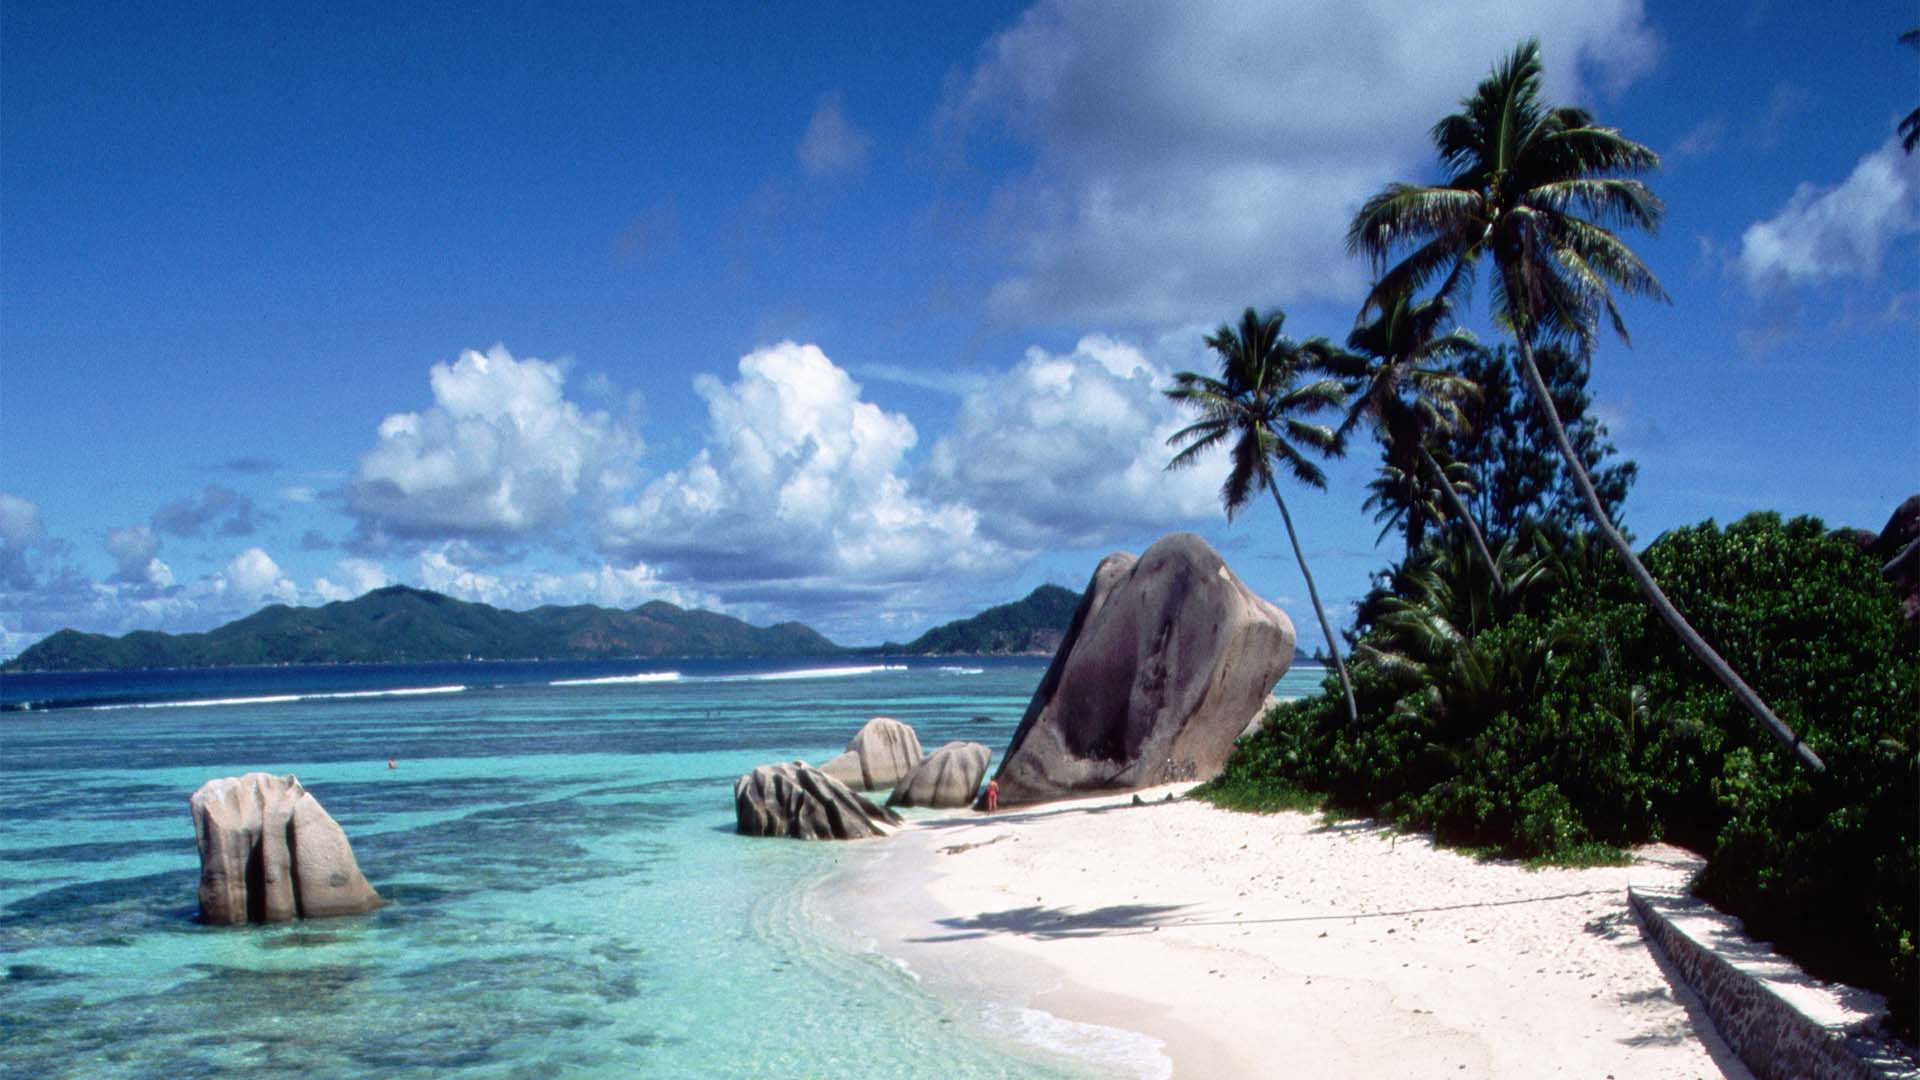 White beaches and sandy shores, Seychelles